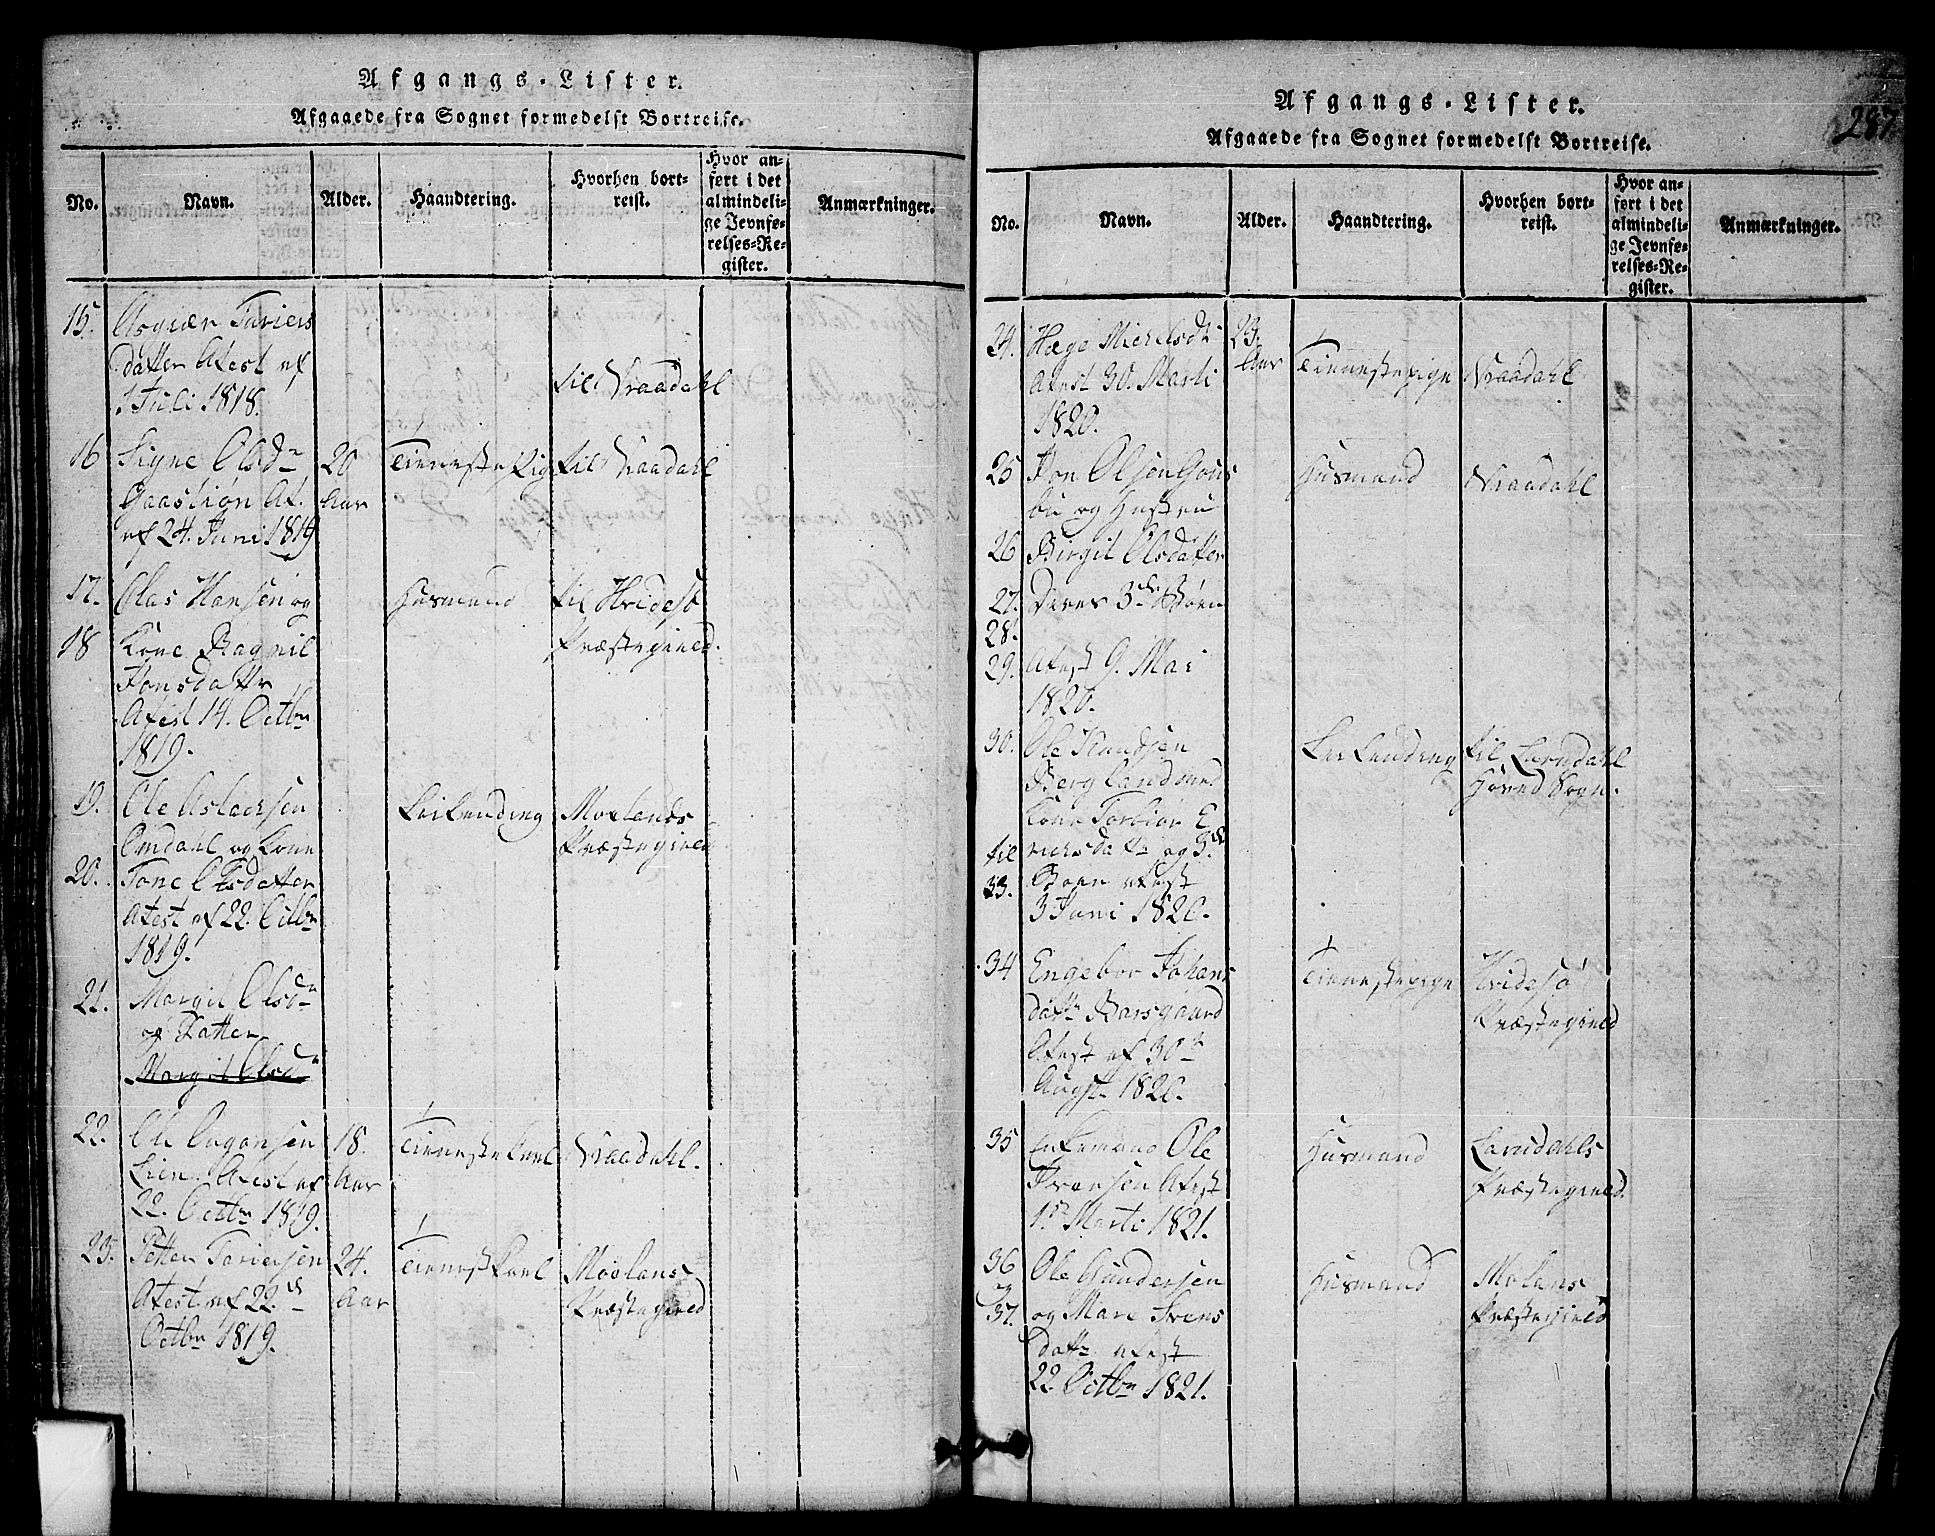 SAKO, Mo kirkebøker, G/Gb/L0001: Klokkerbok nr. II 1, 1814-1843, s. 287